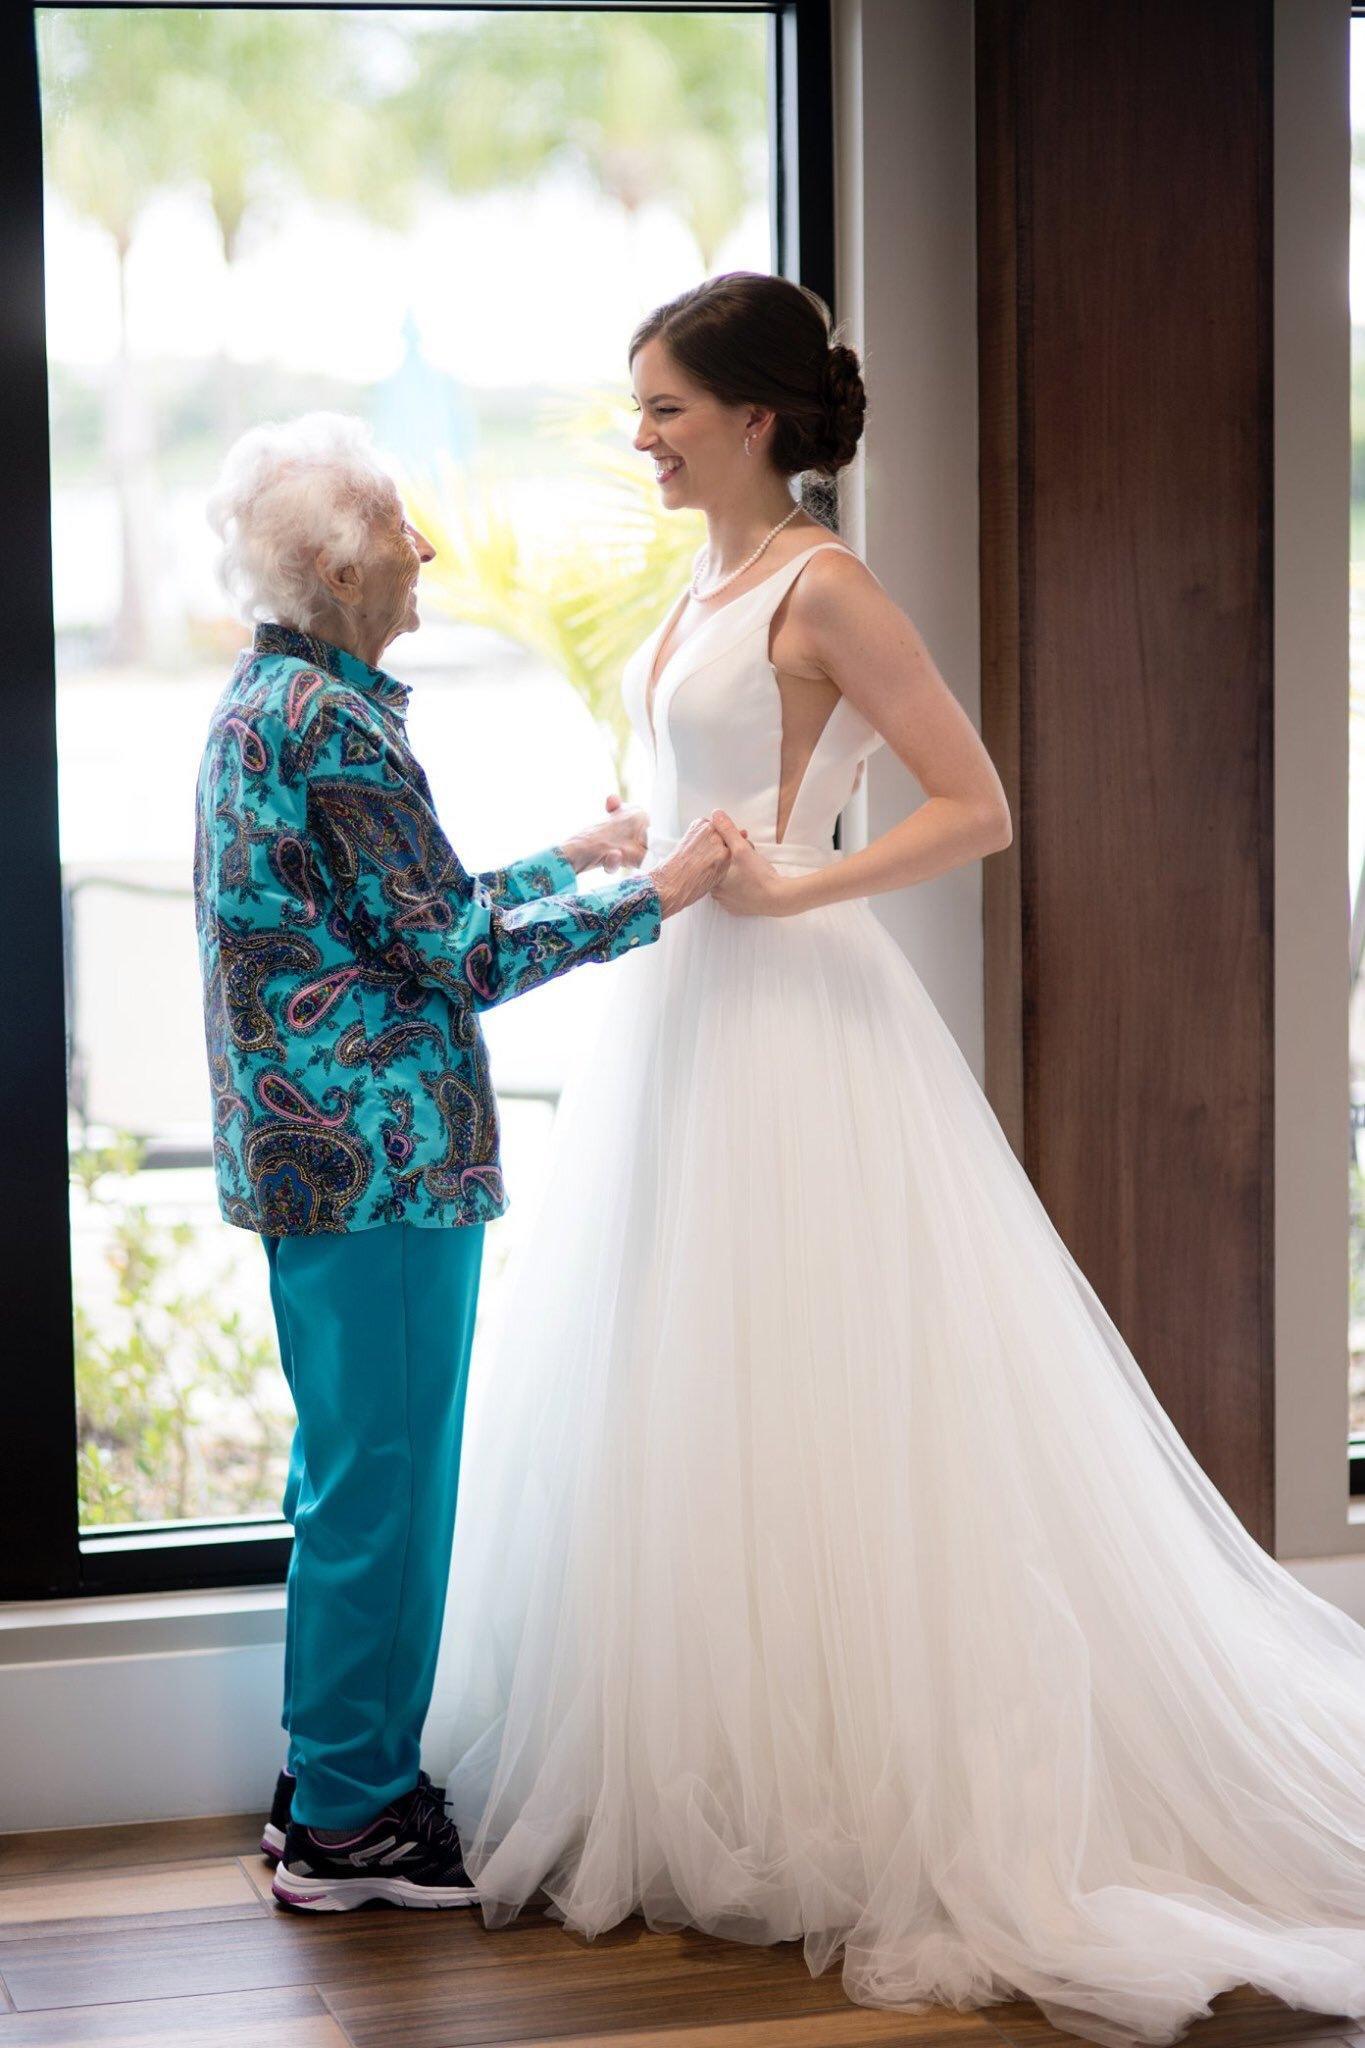 2-grandma-wedding-1566836296309.jpeg